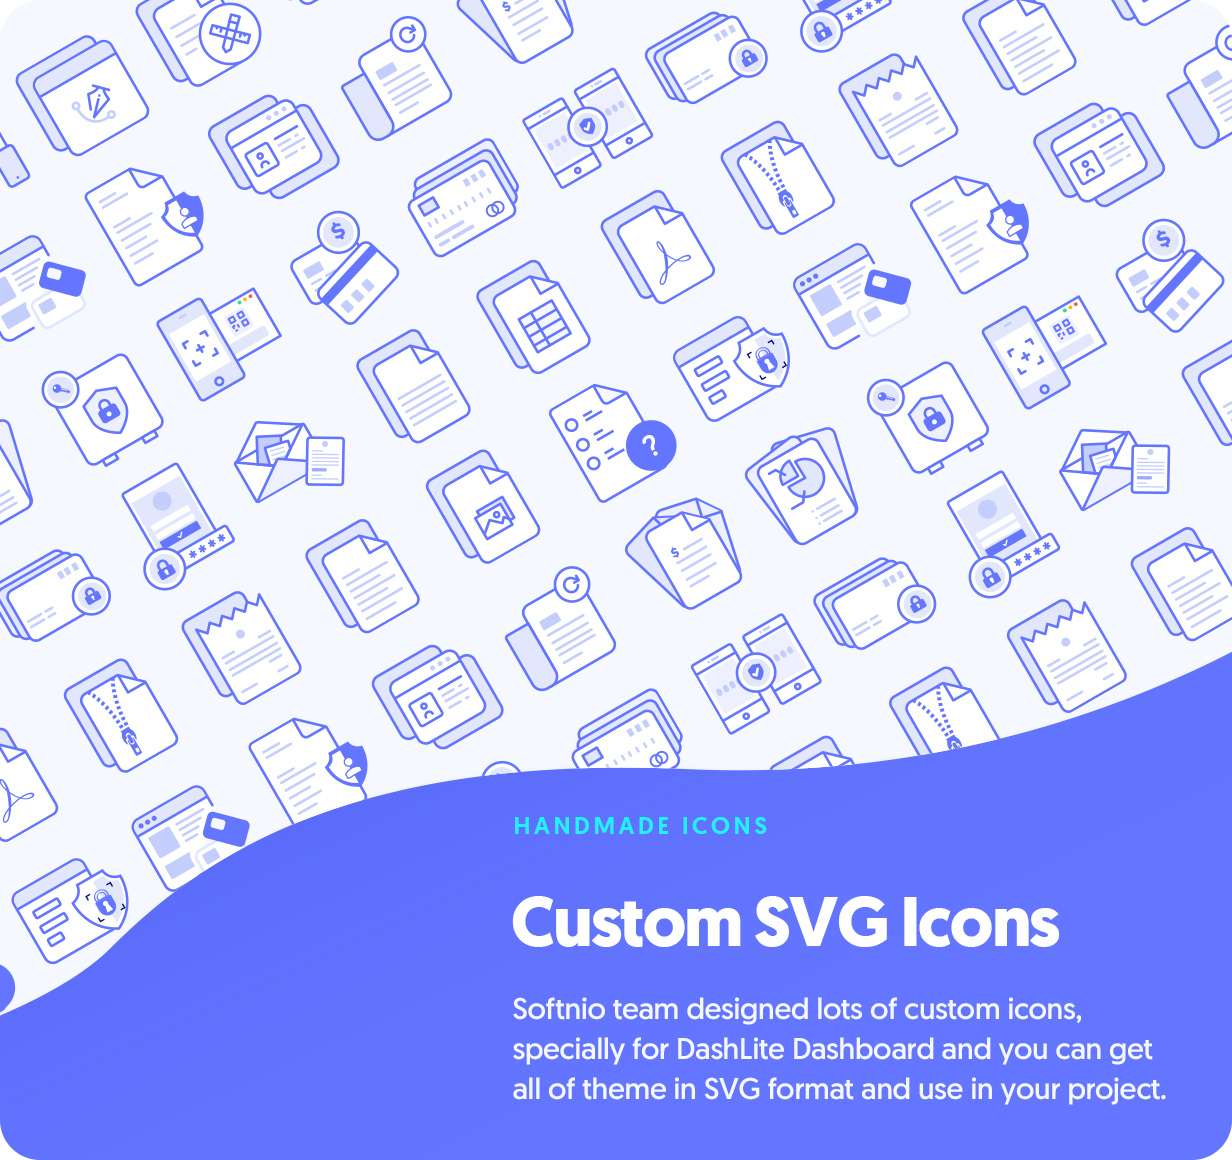 DashLite - Custom Handmade SVG Icons